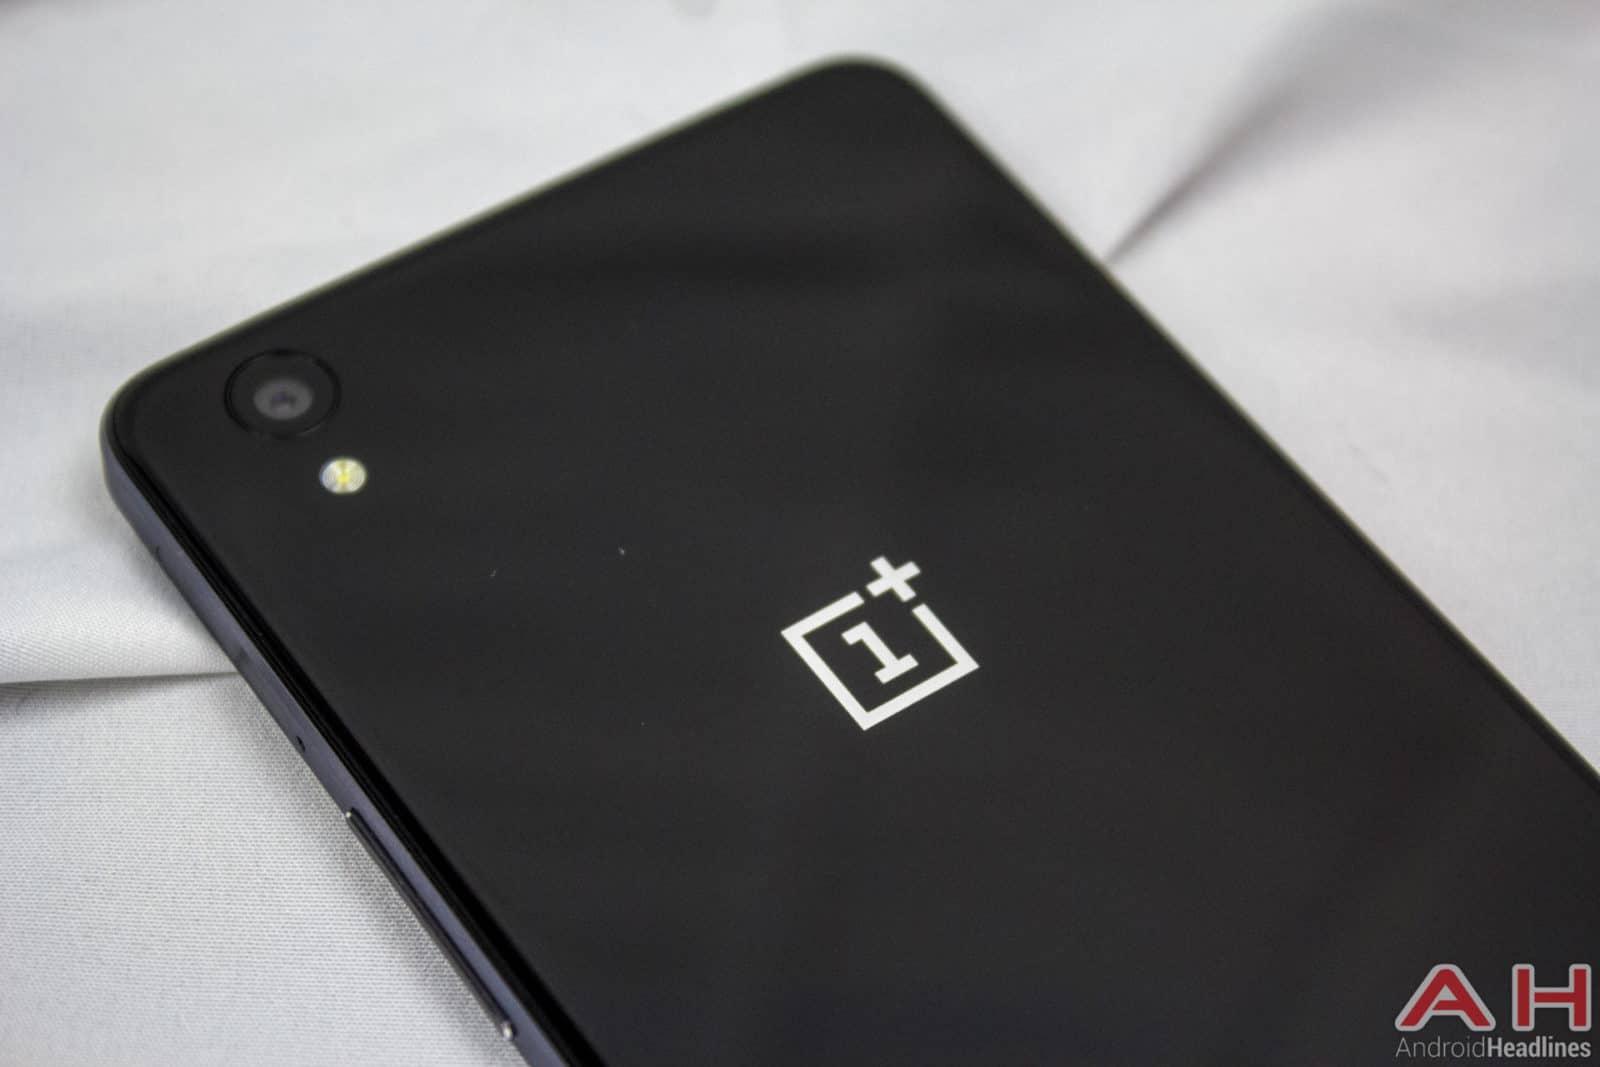 OnePlus-X-AH-logo-3